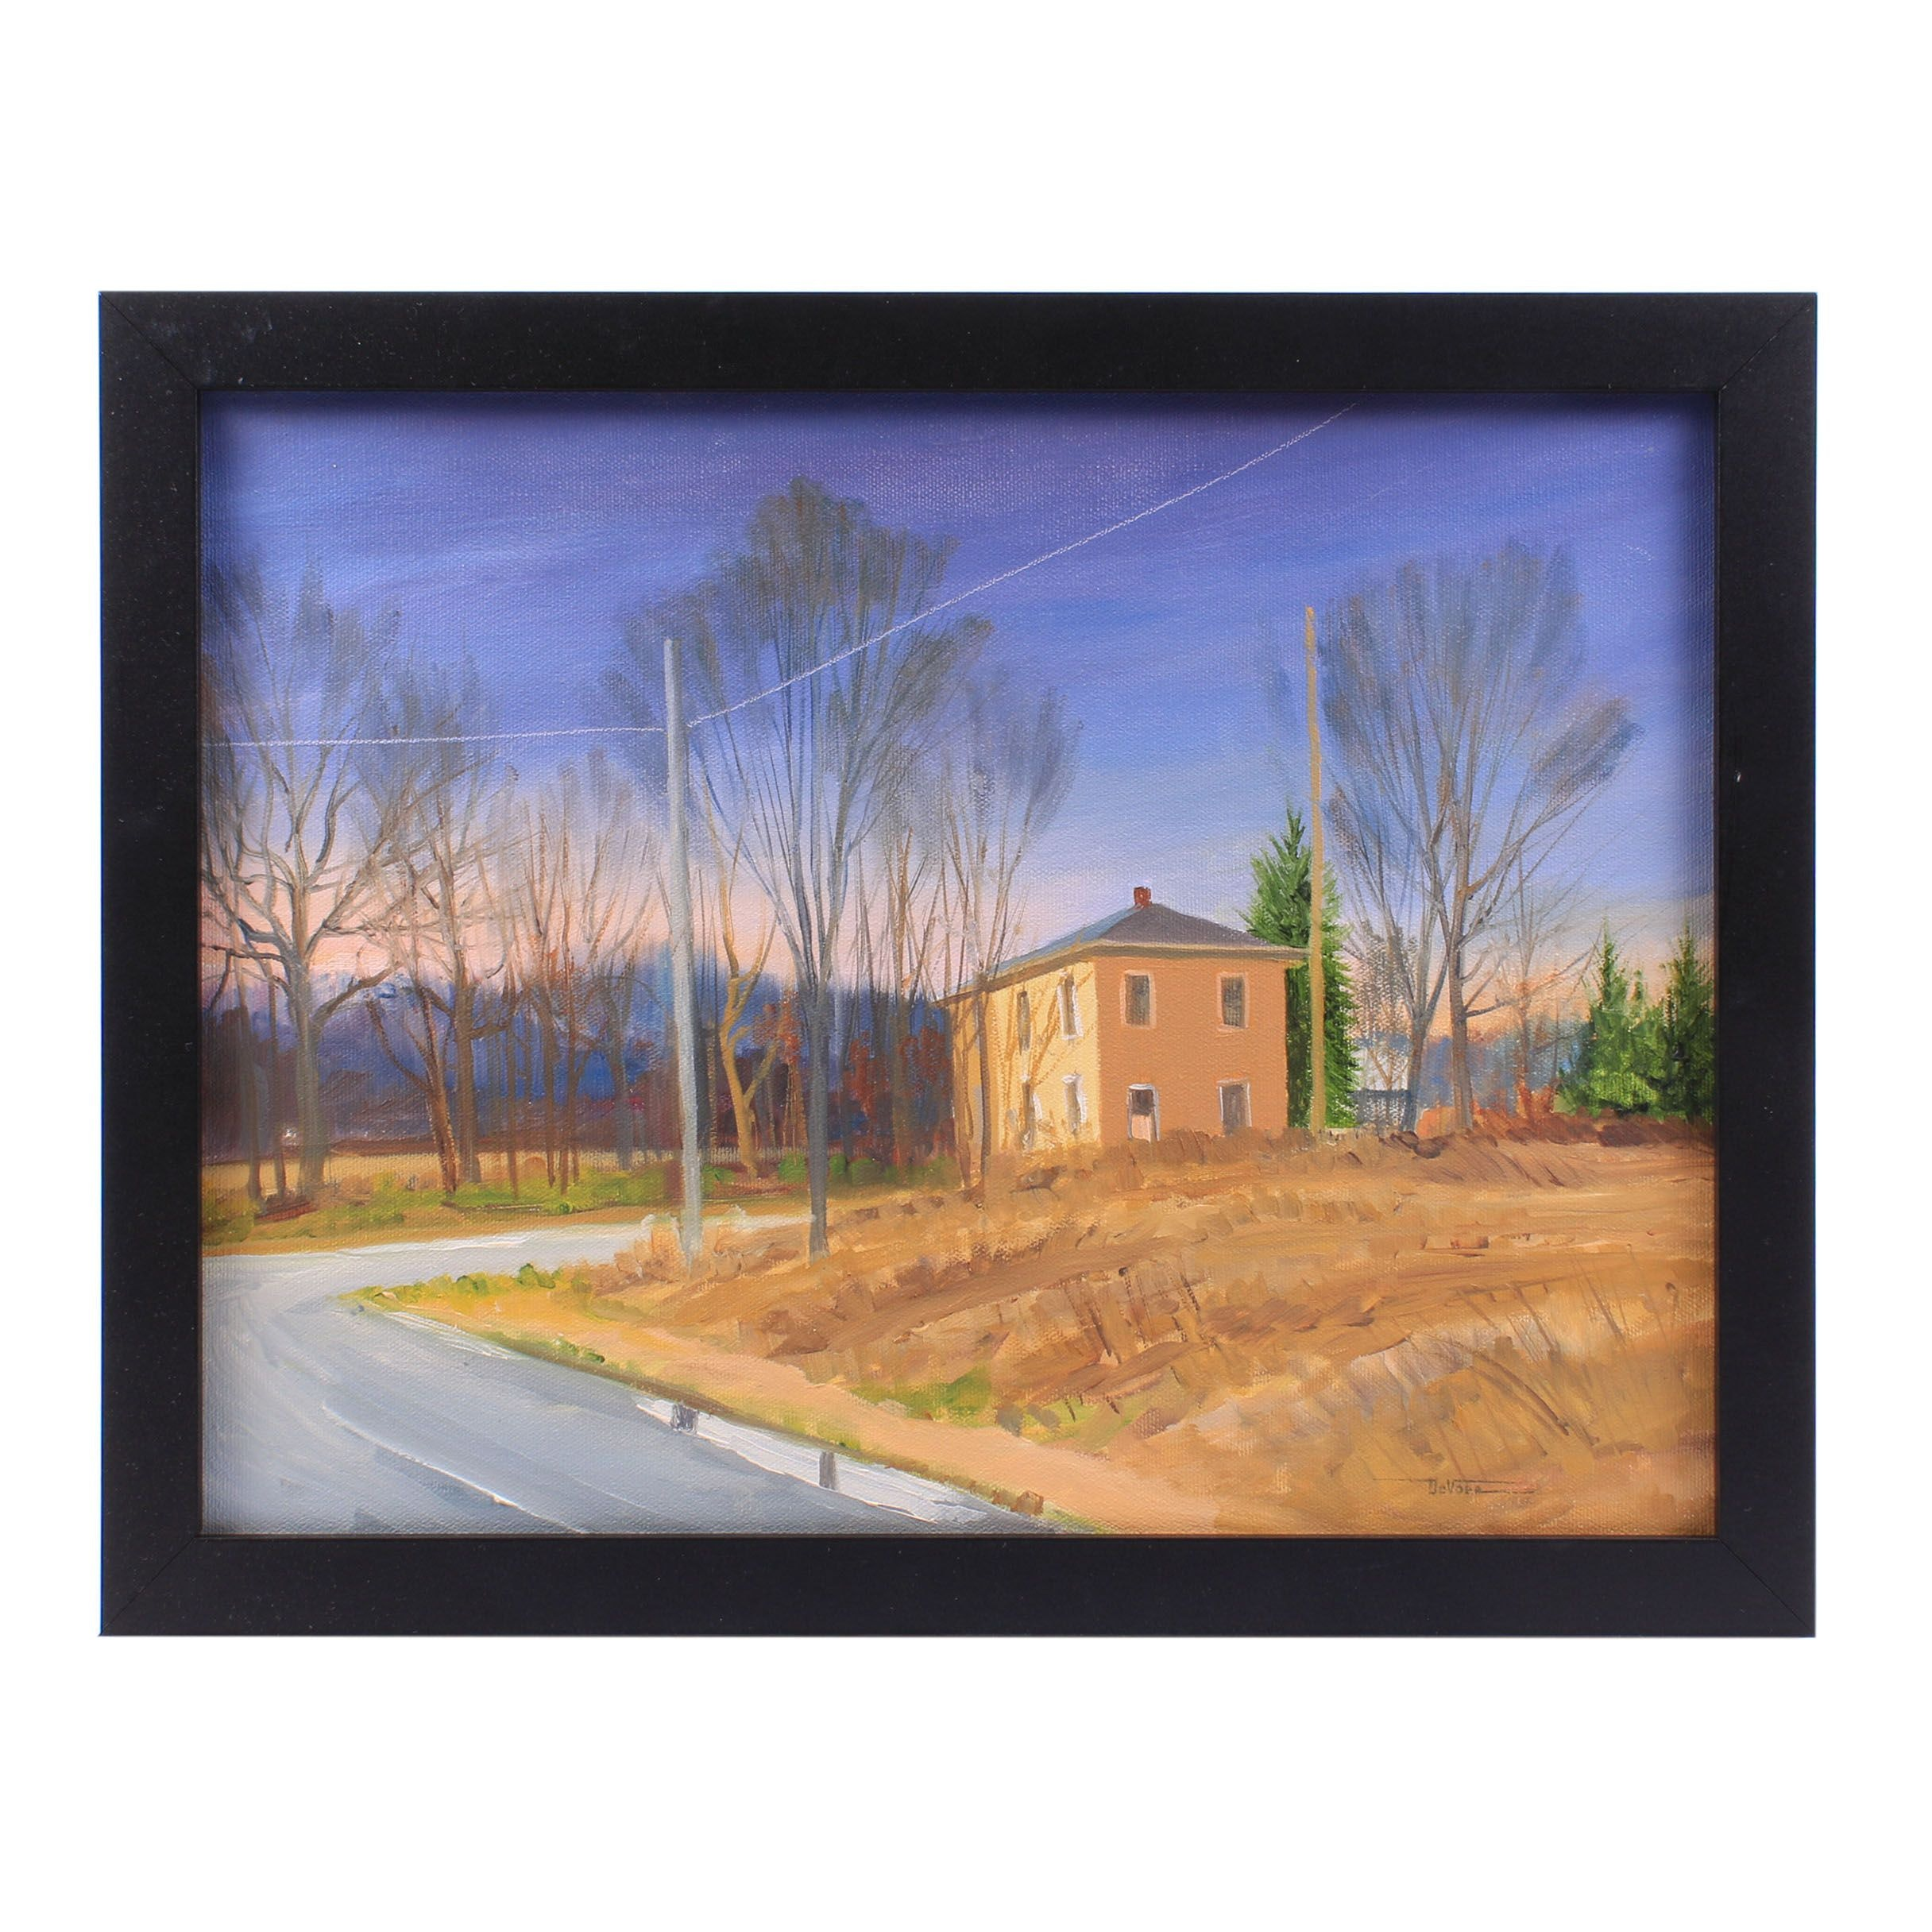 James DeVore Sunset Landscape Oil Painting